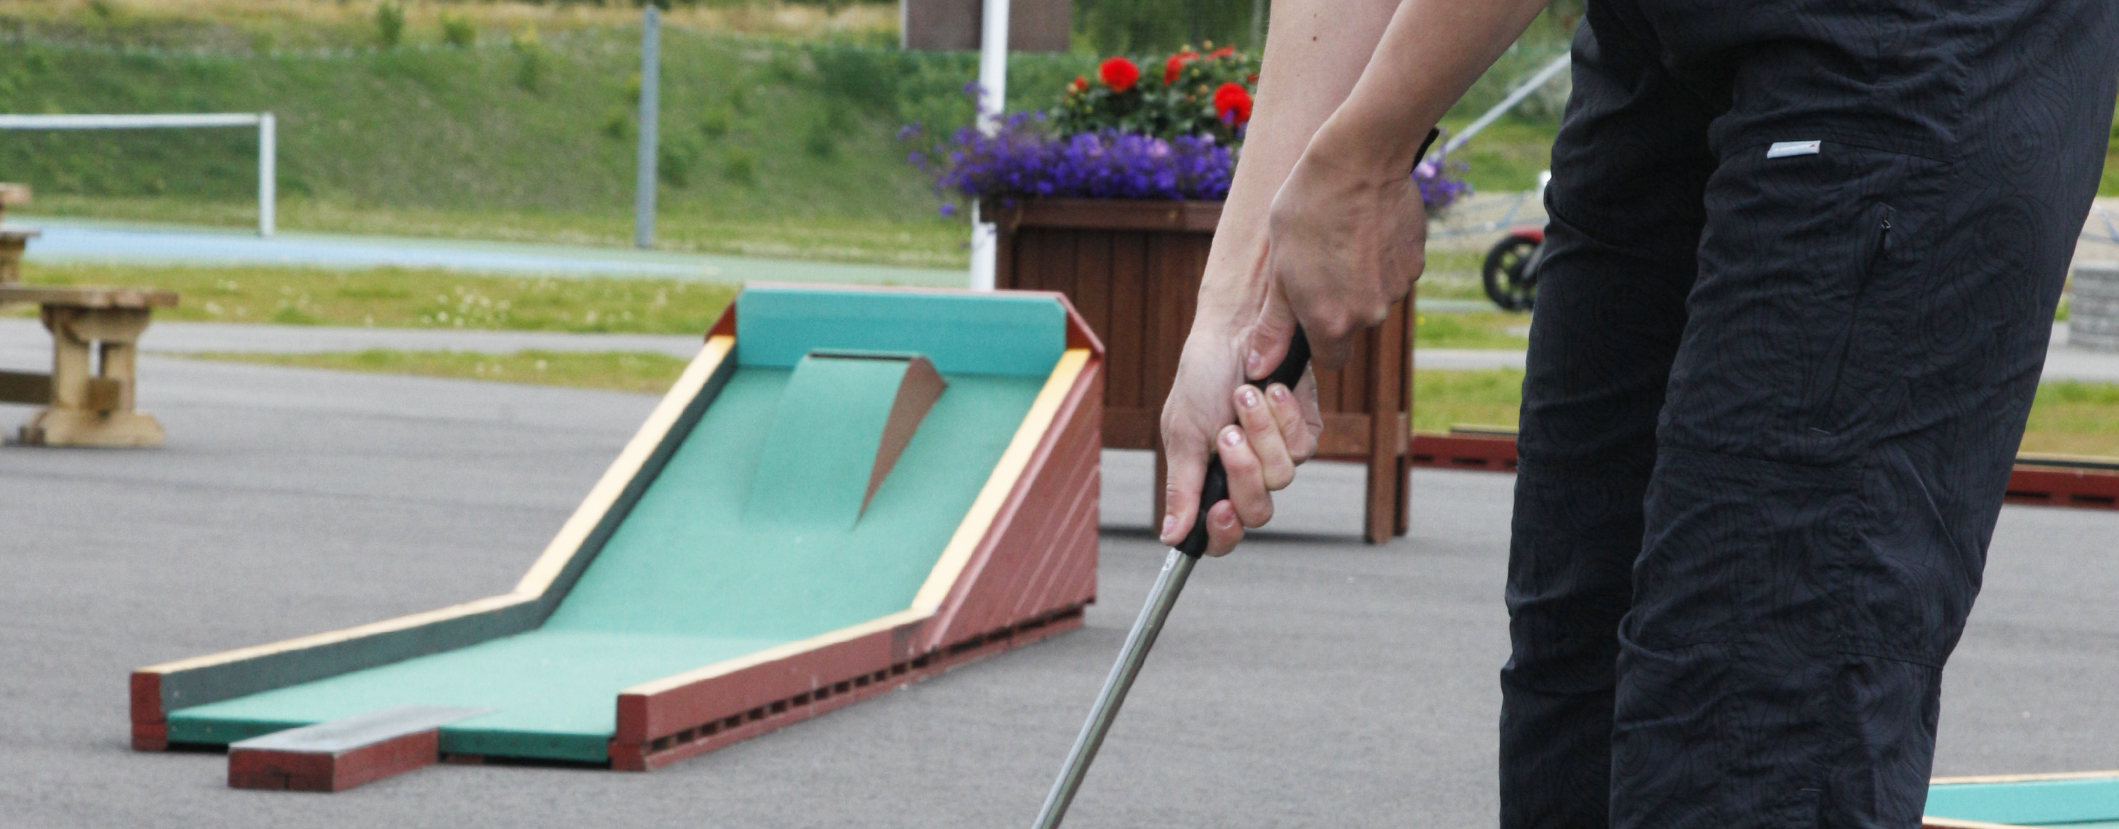 Levi_miniature_golf